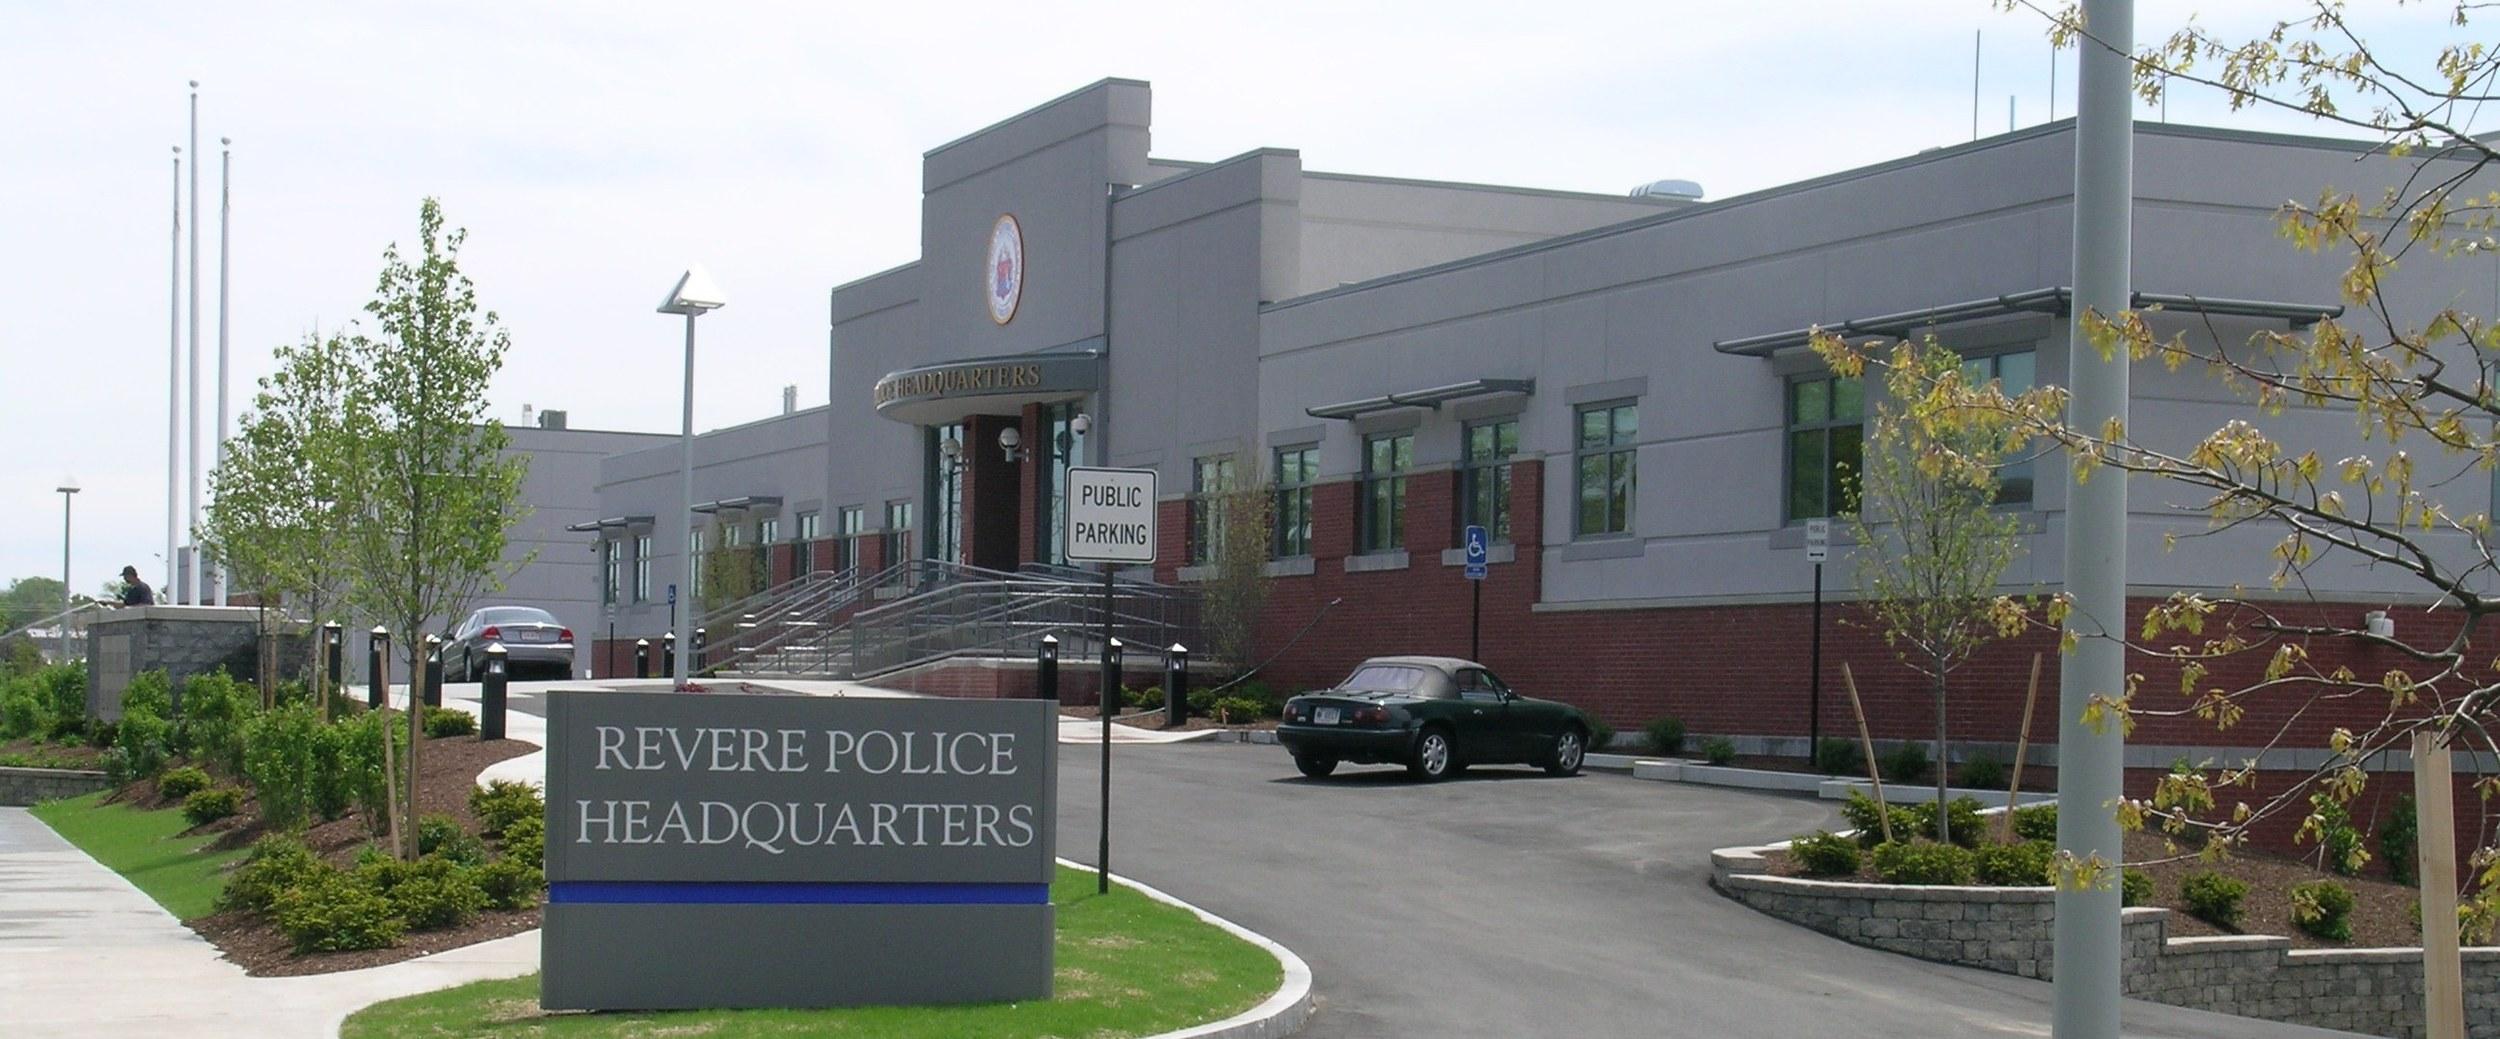 Revere Police Headquarters